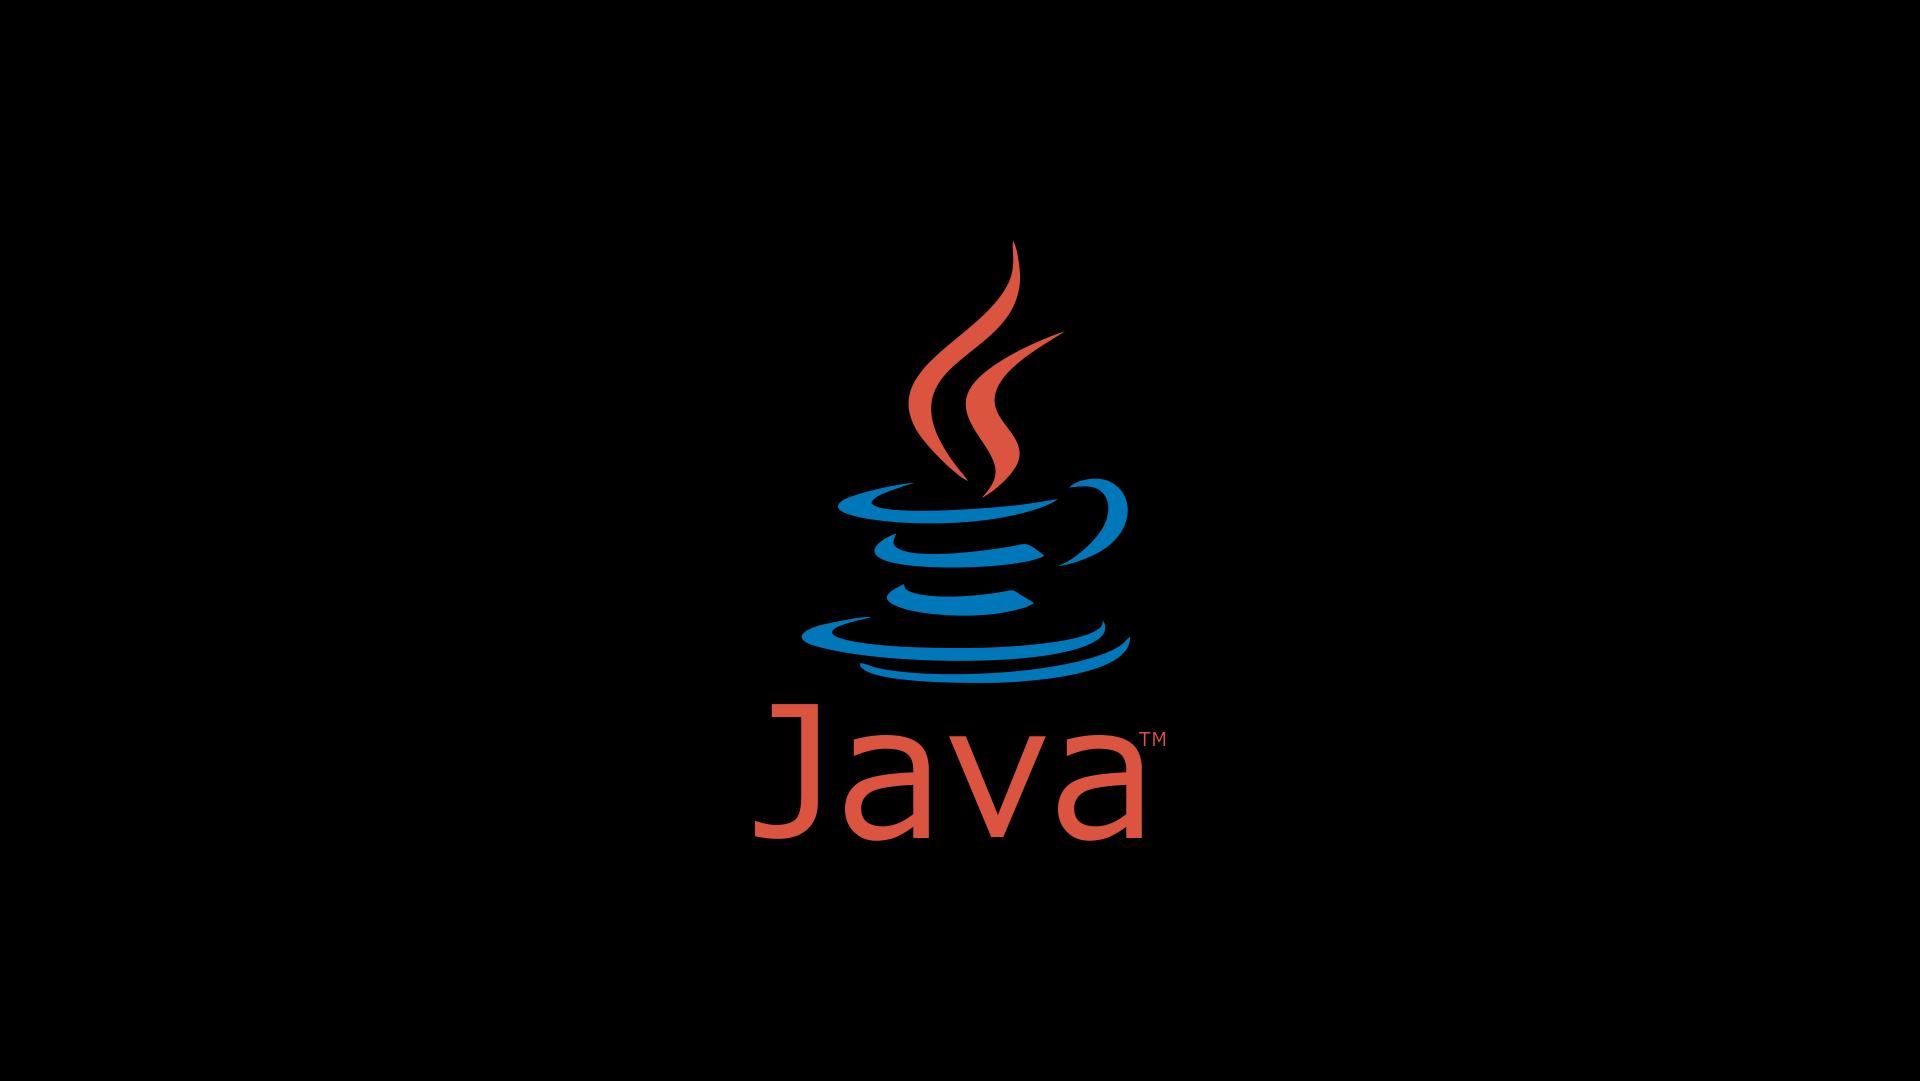 java对XML文件的解析、节点的增加、删除操作总结